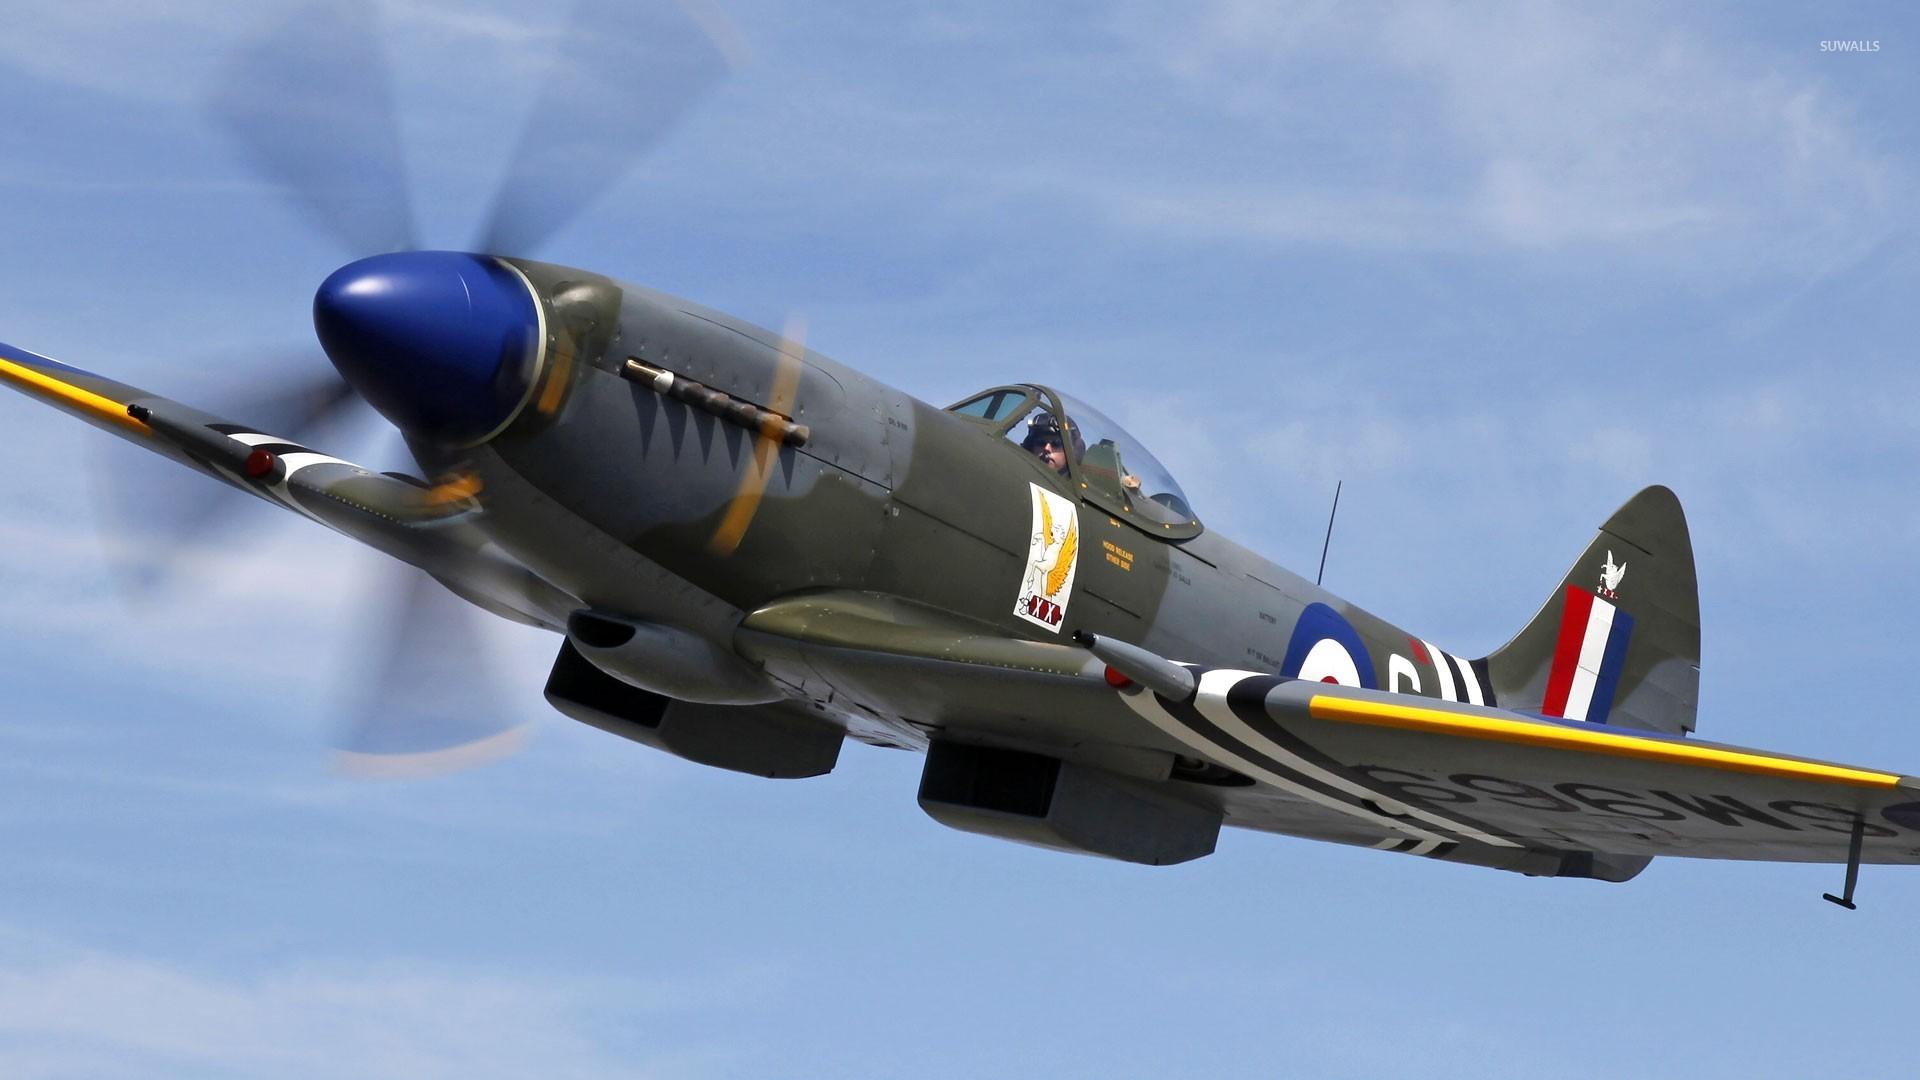 Supermarine Spitfire 8 Wallpaper Aircraft Wallpapers